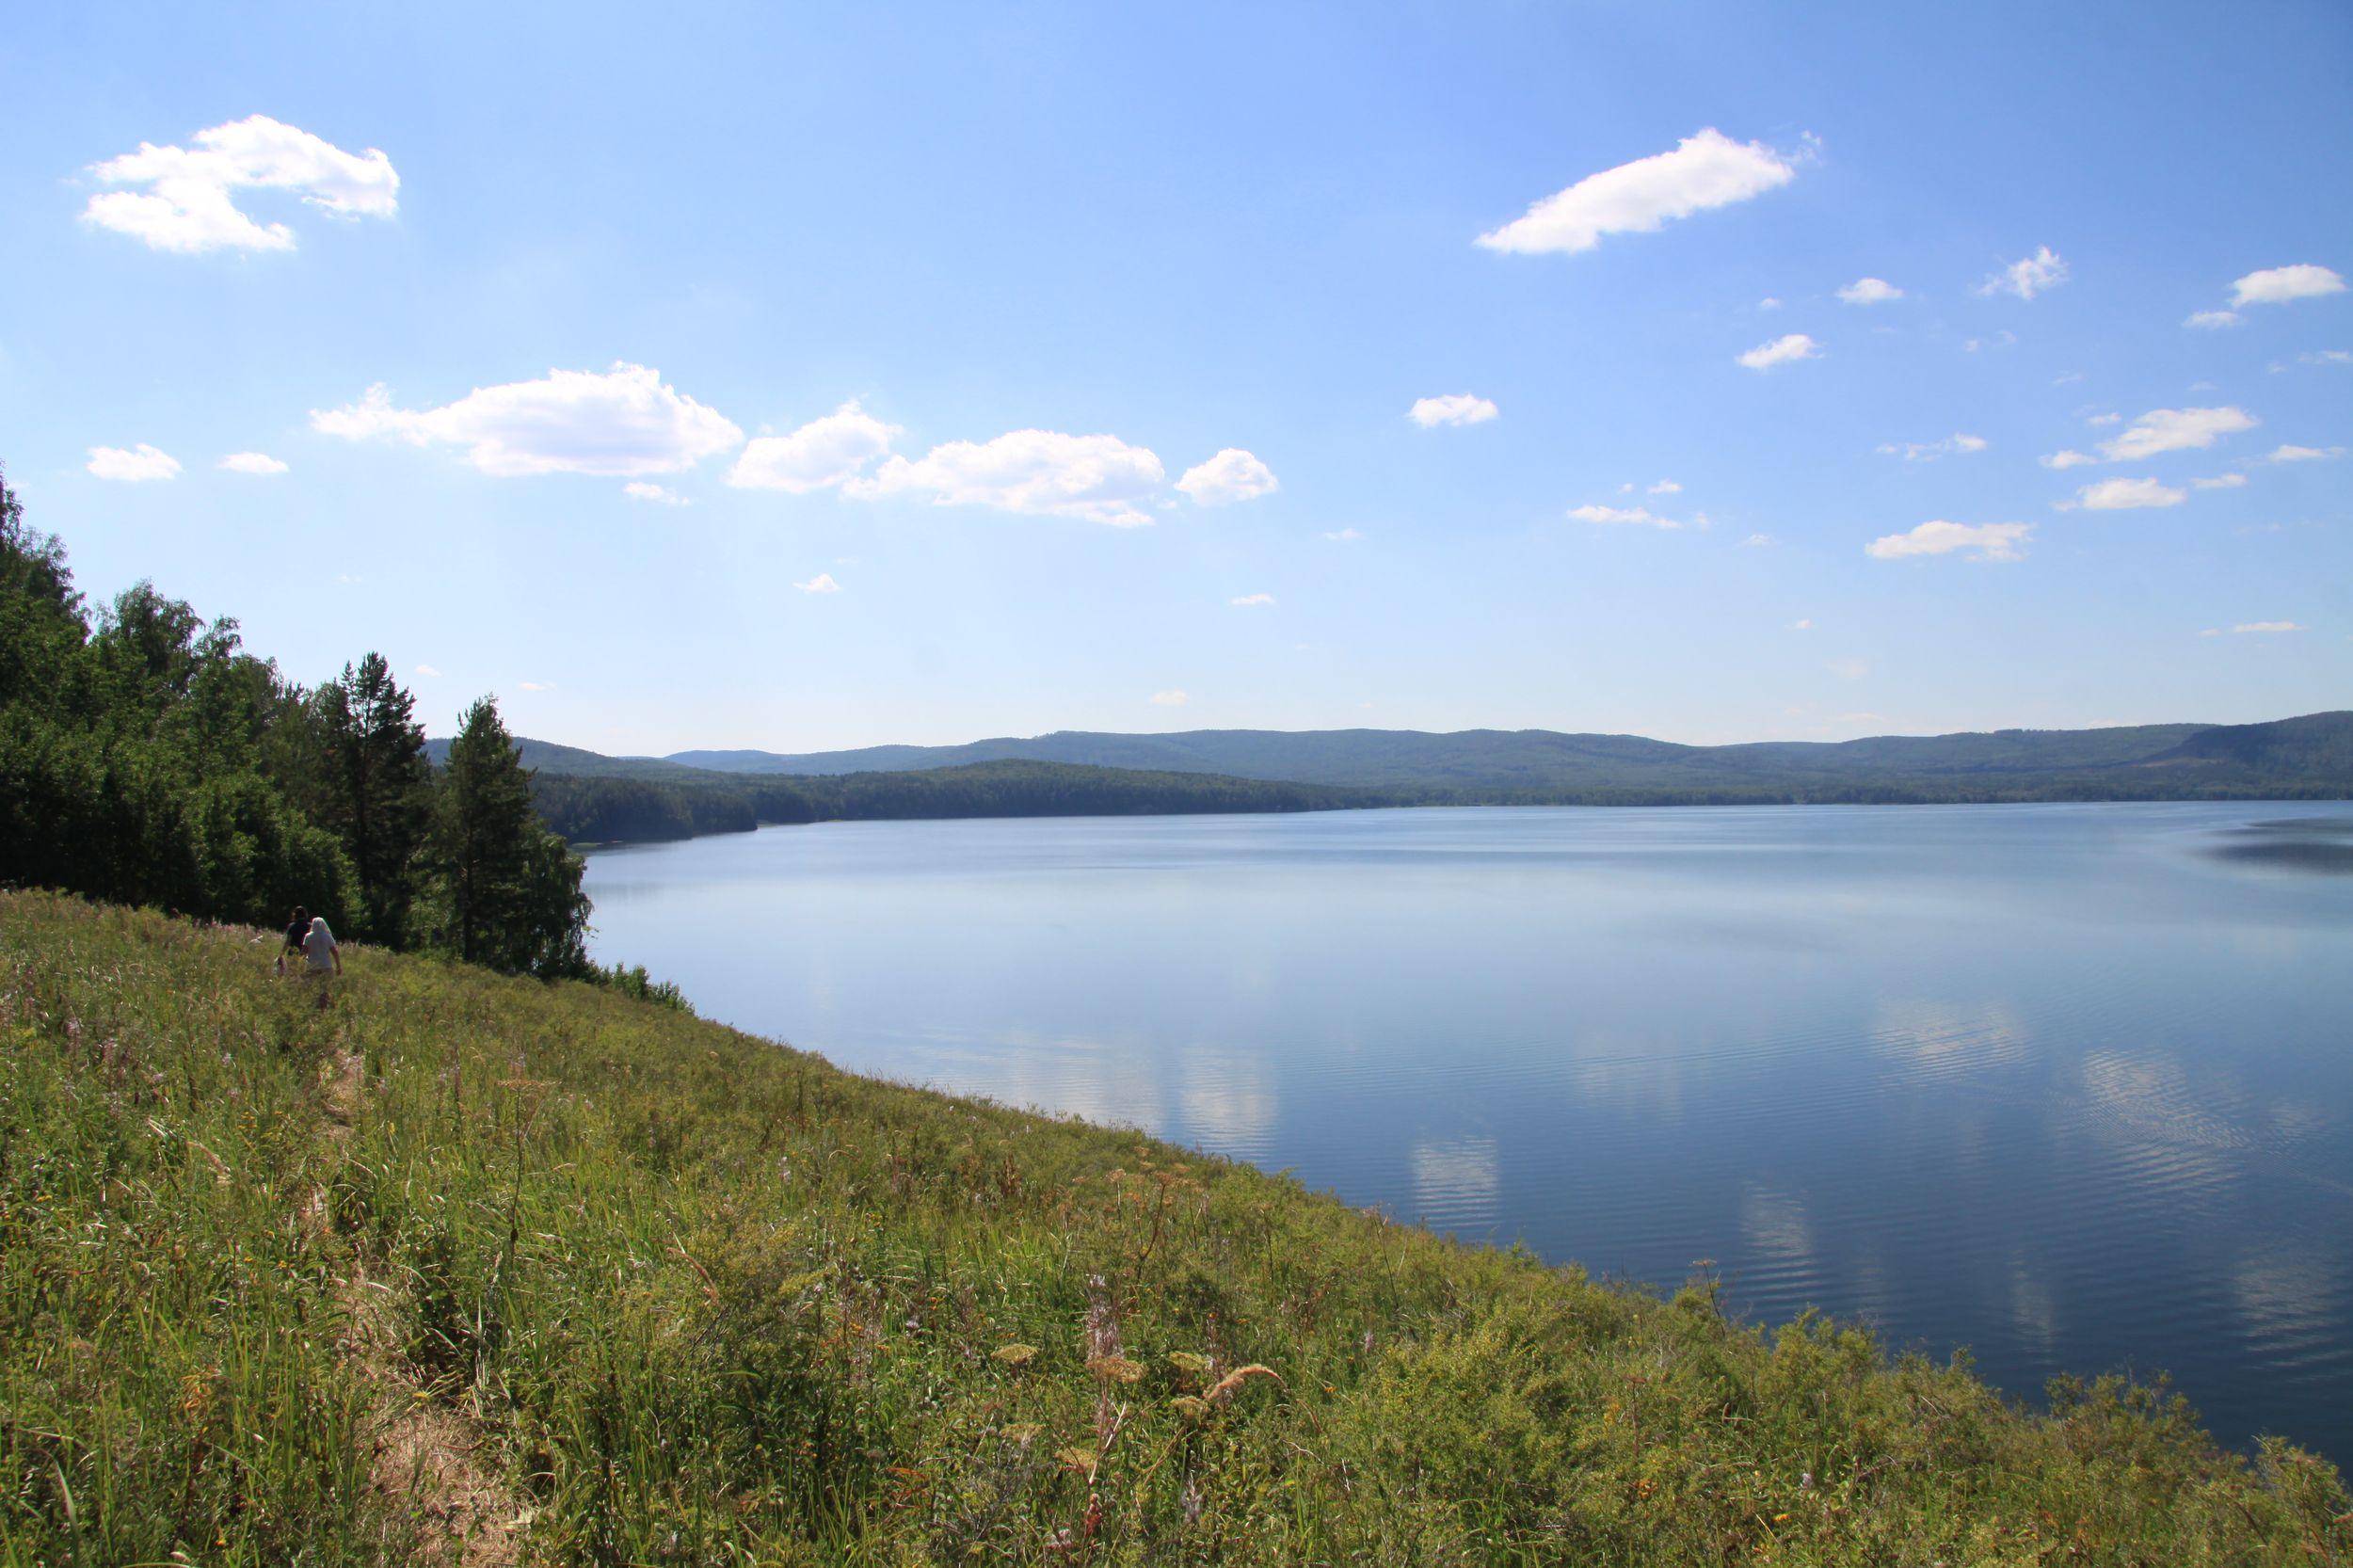 озеро еткуль картинка властям